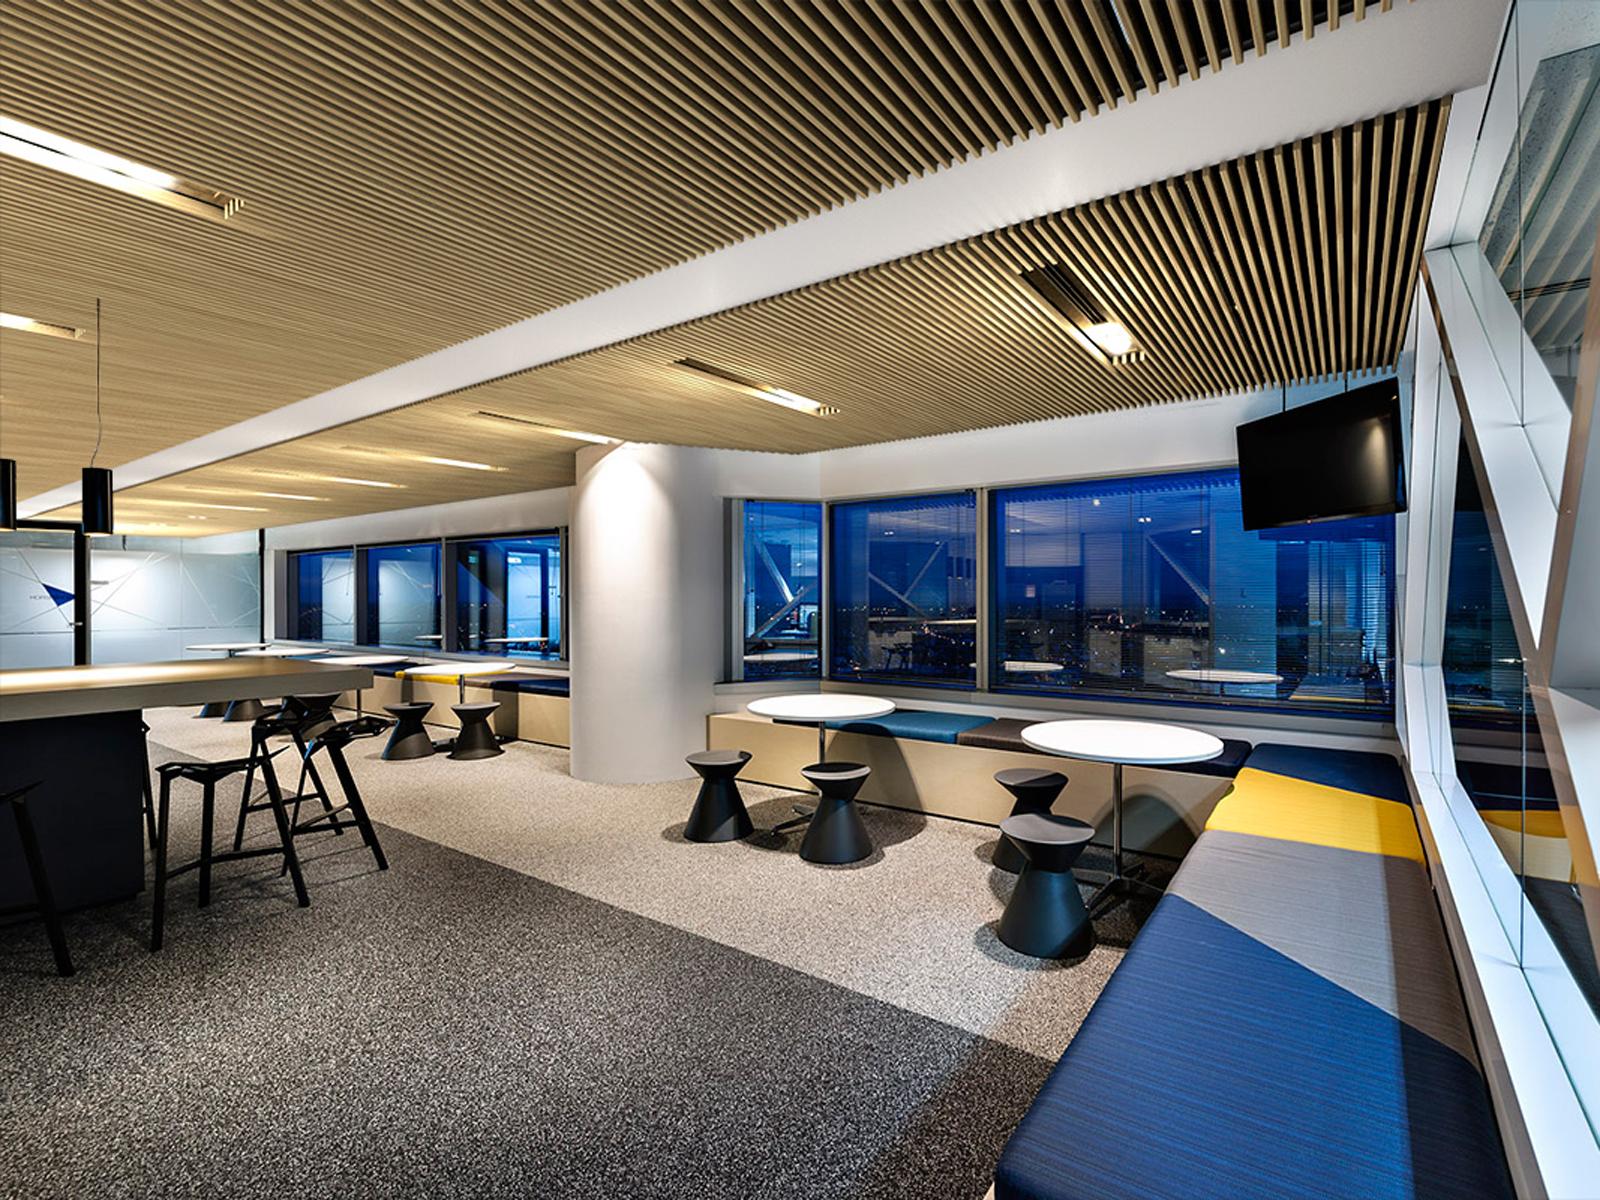 Supaslat Acoustic ceiling